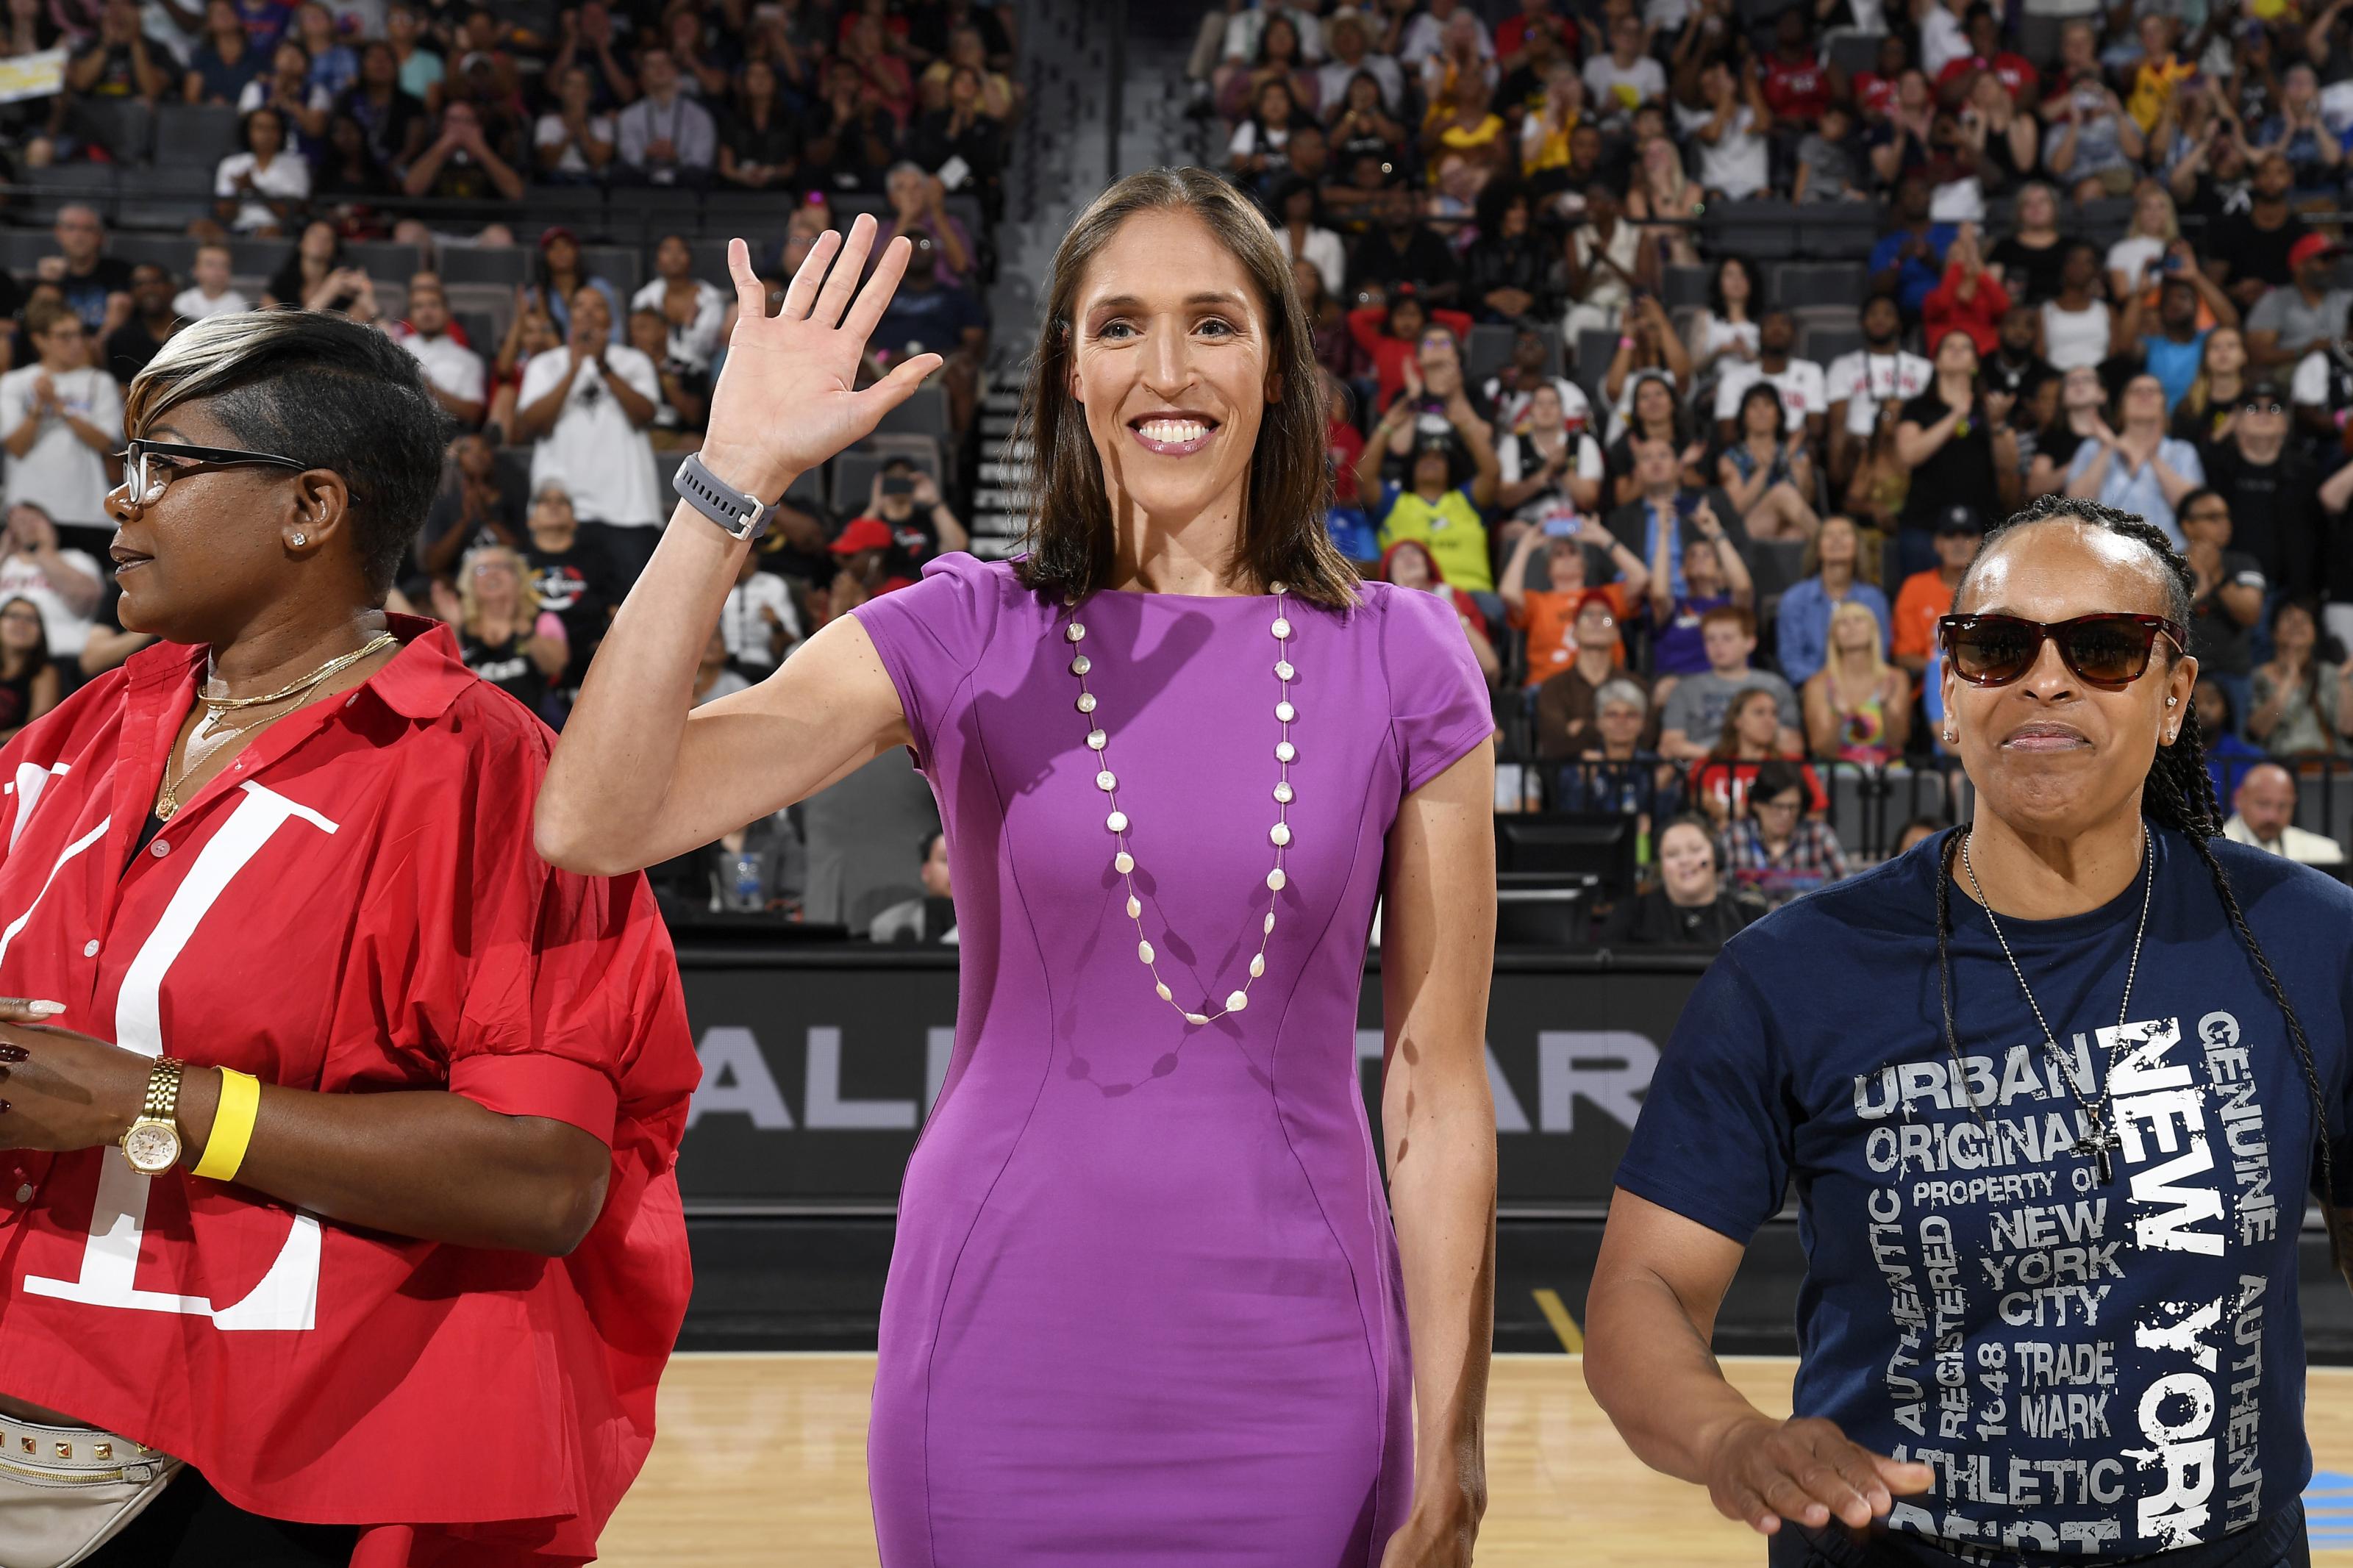 Women's basketball: Rebecca Lobo to Receive NCAA award